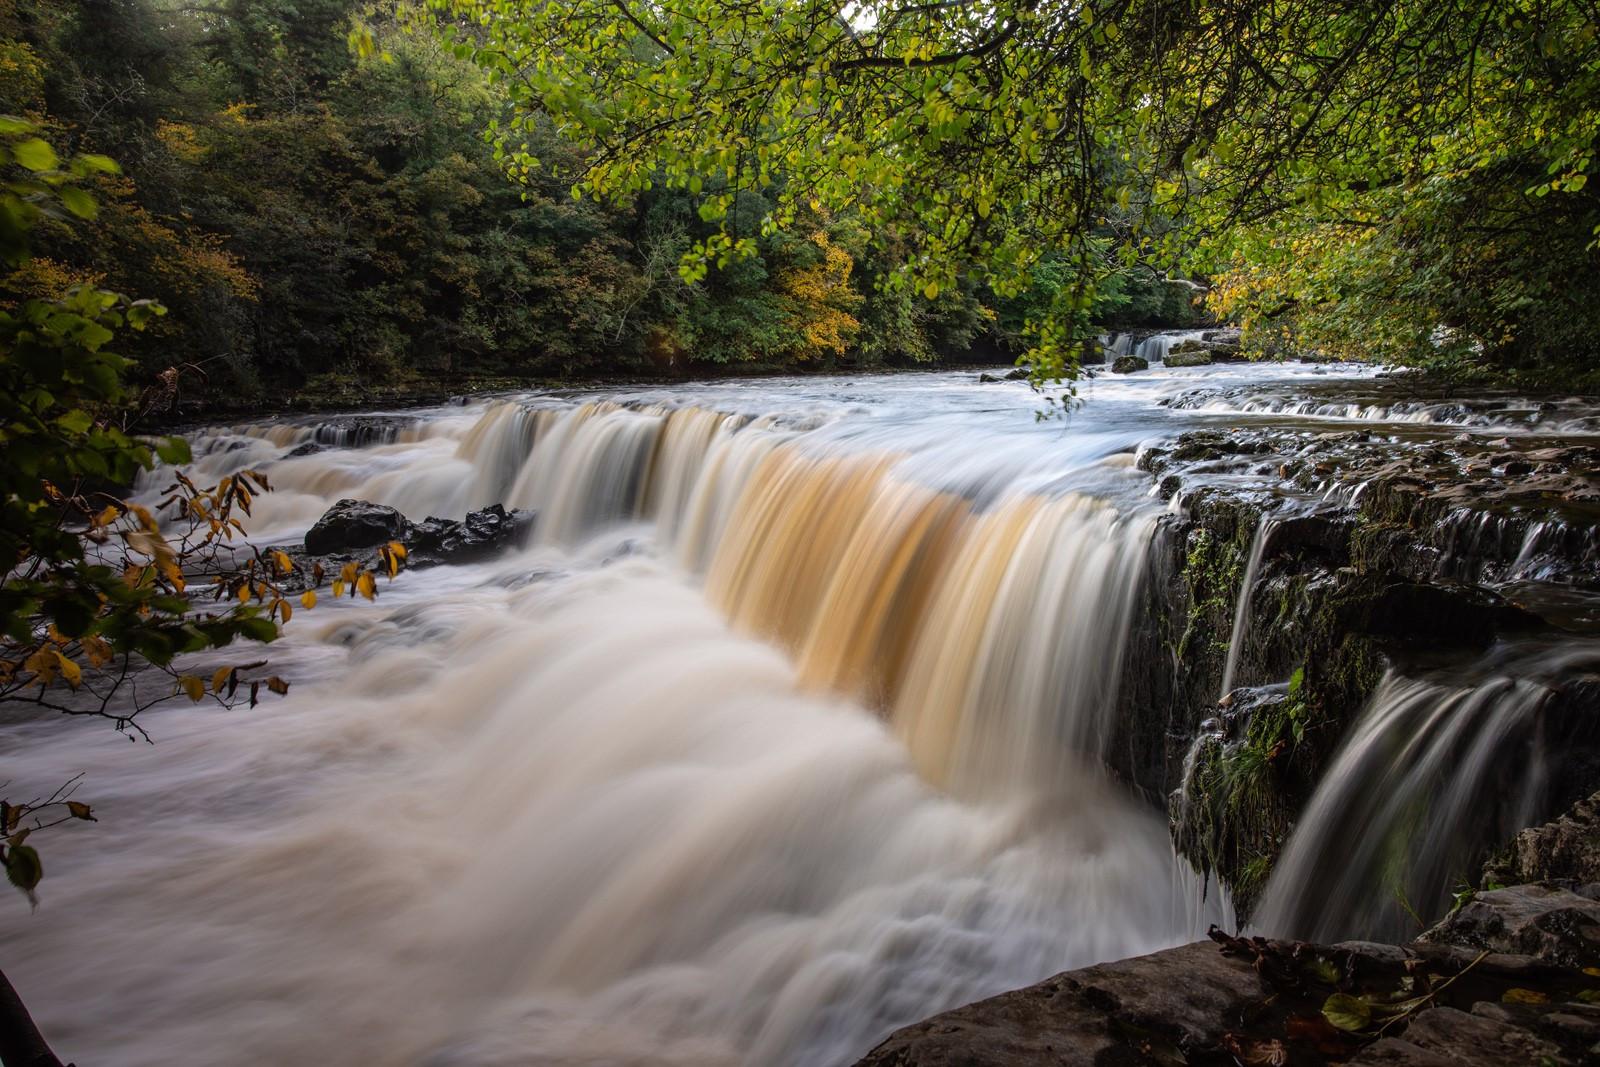 10.Upper Falls, Aysgarth